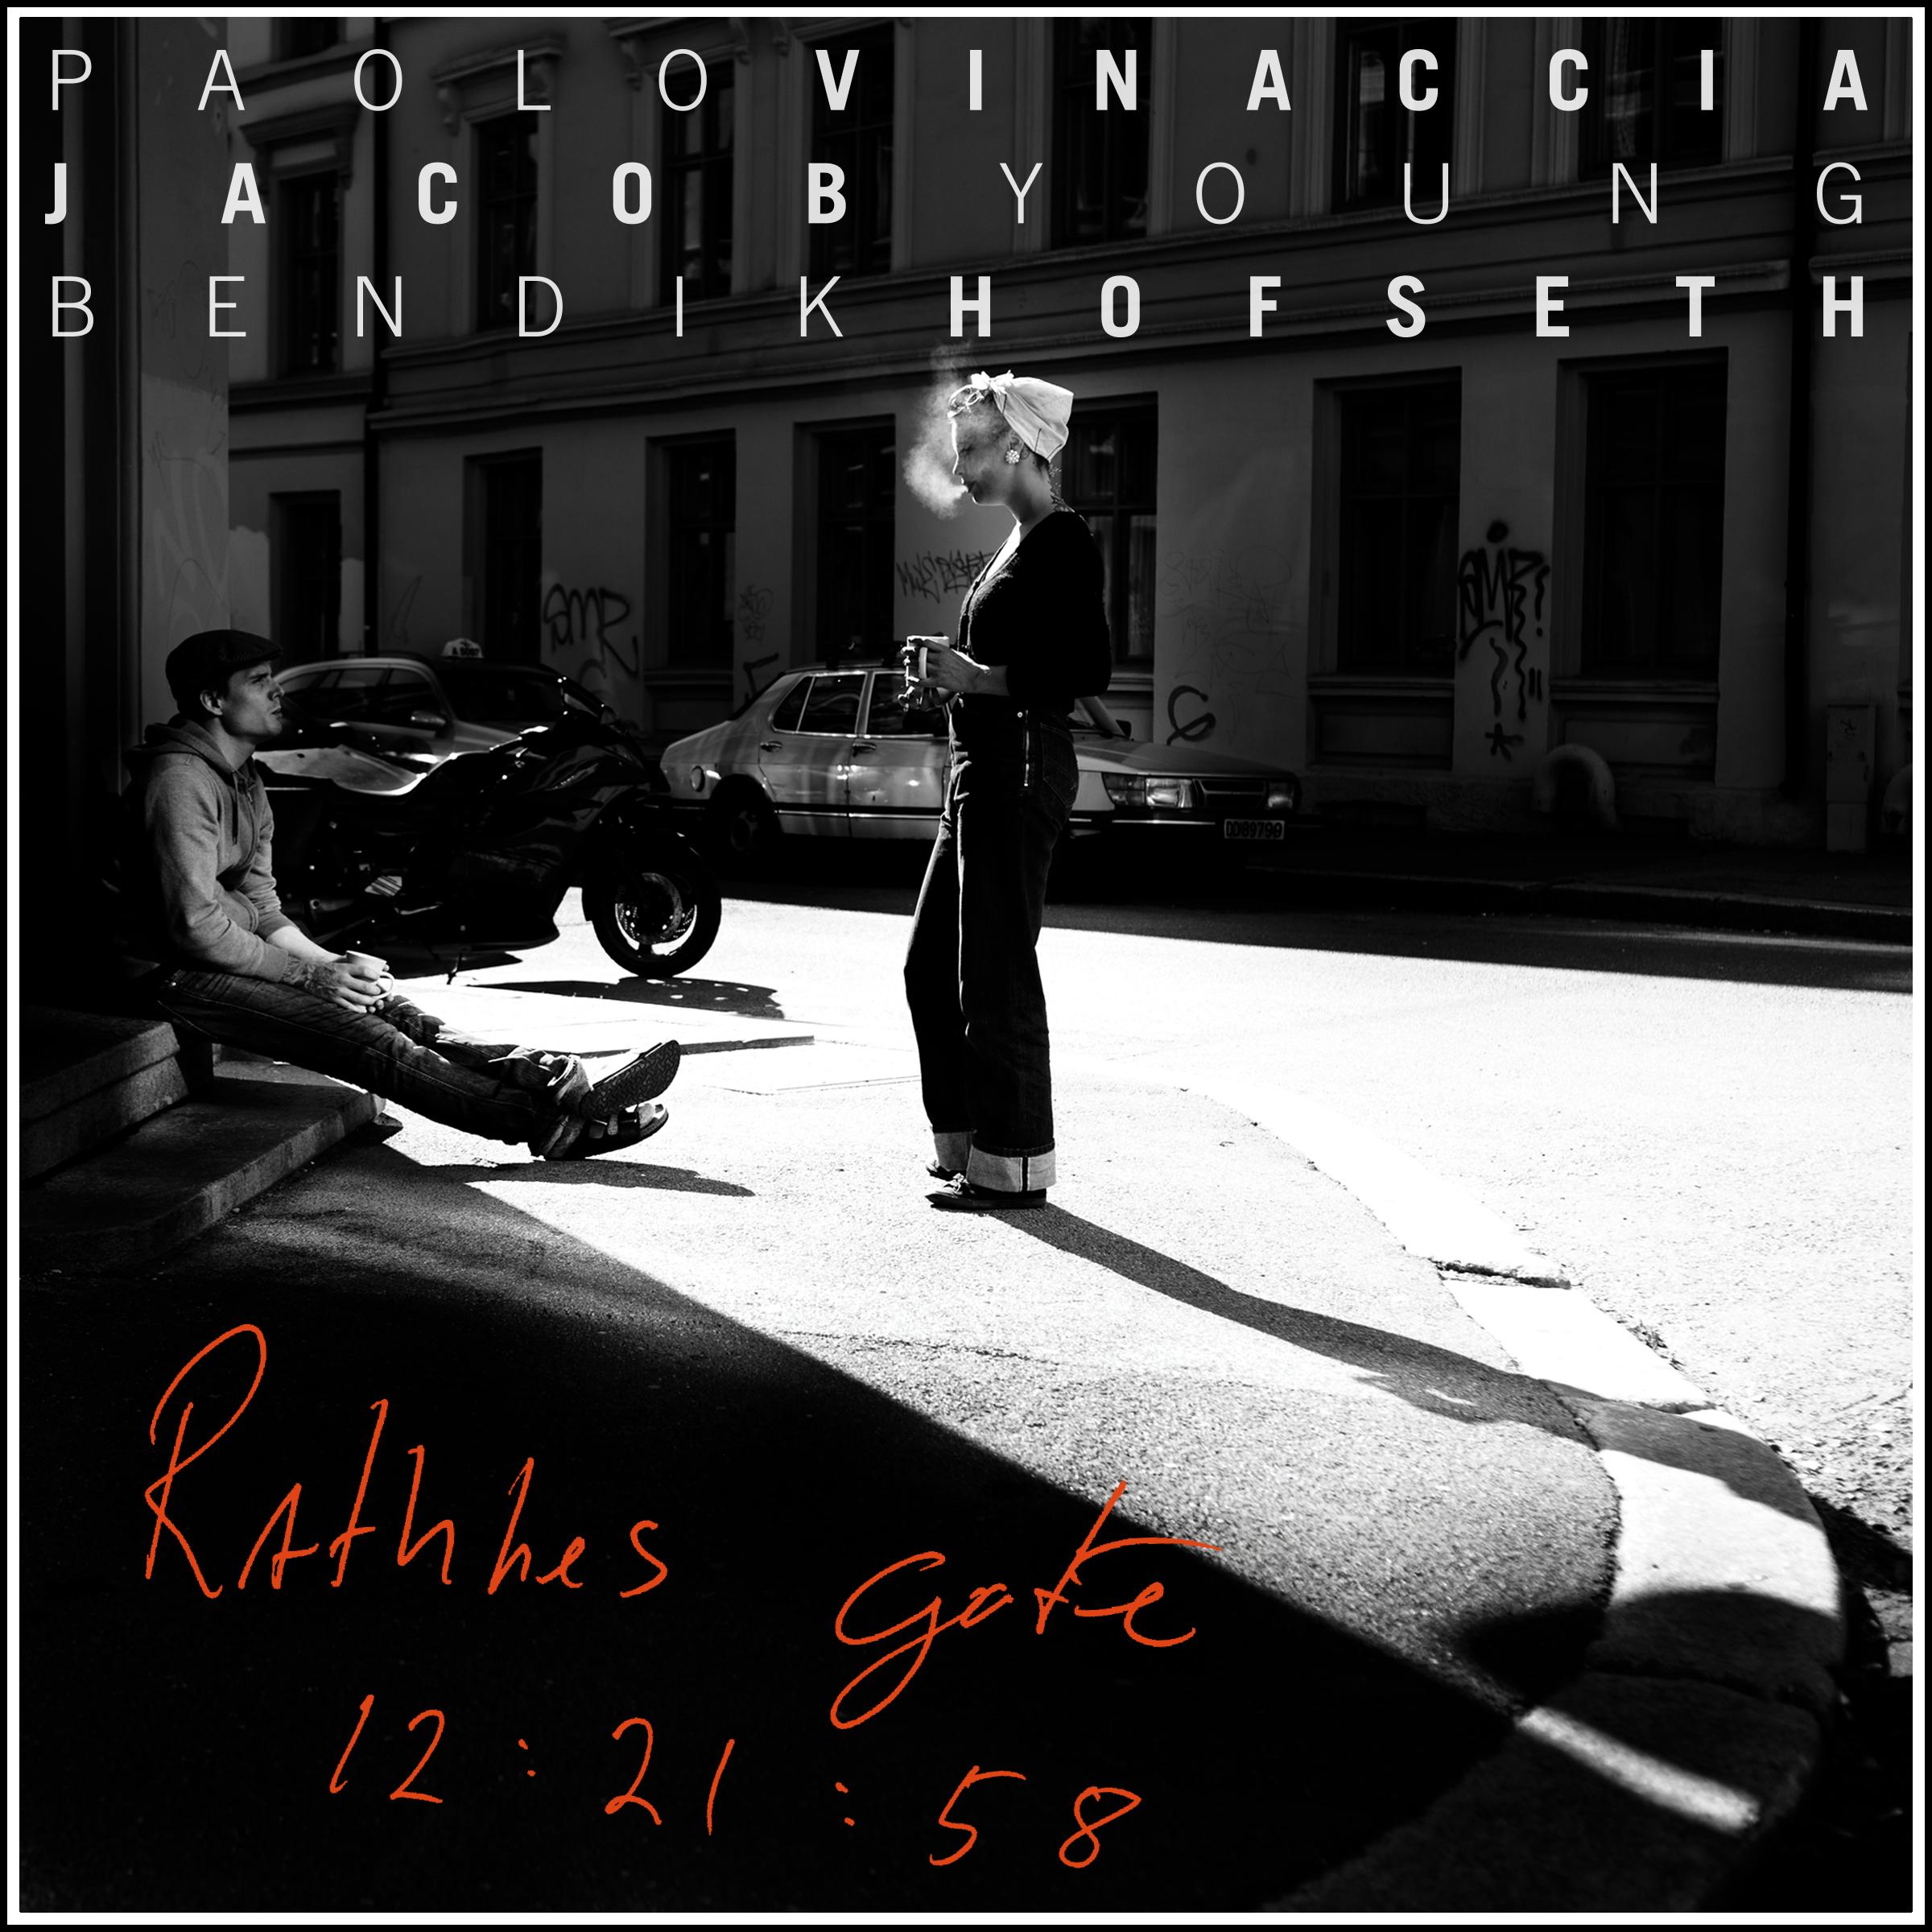 RATHKES GATE 12 21 #341D161.jpg